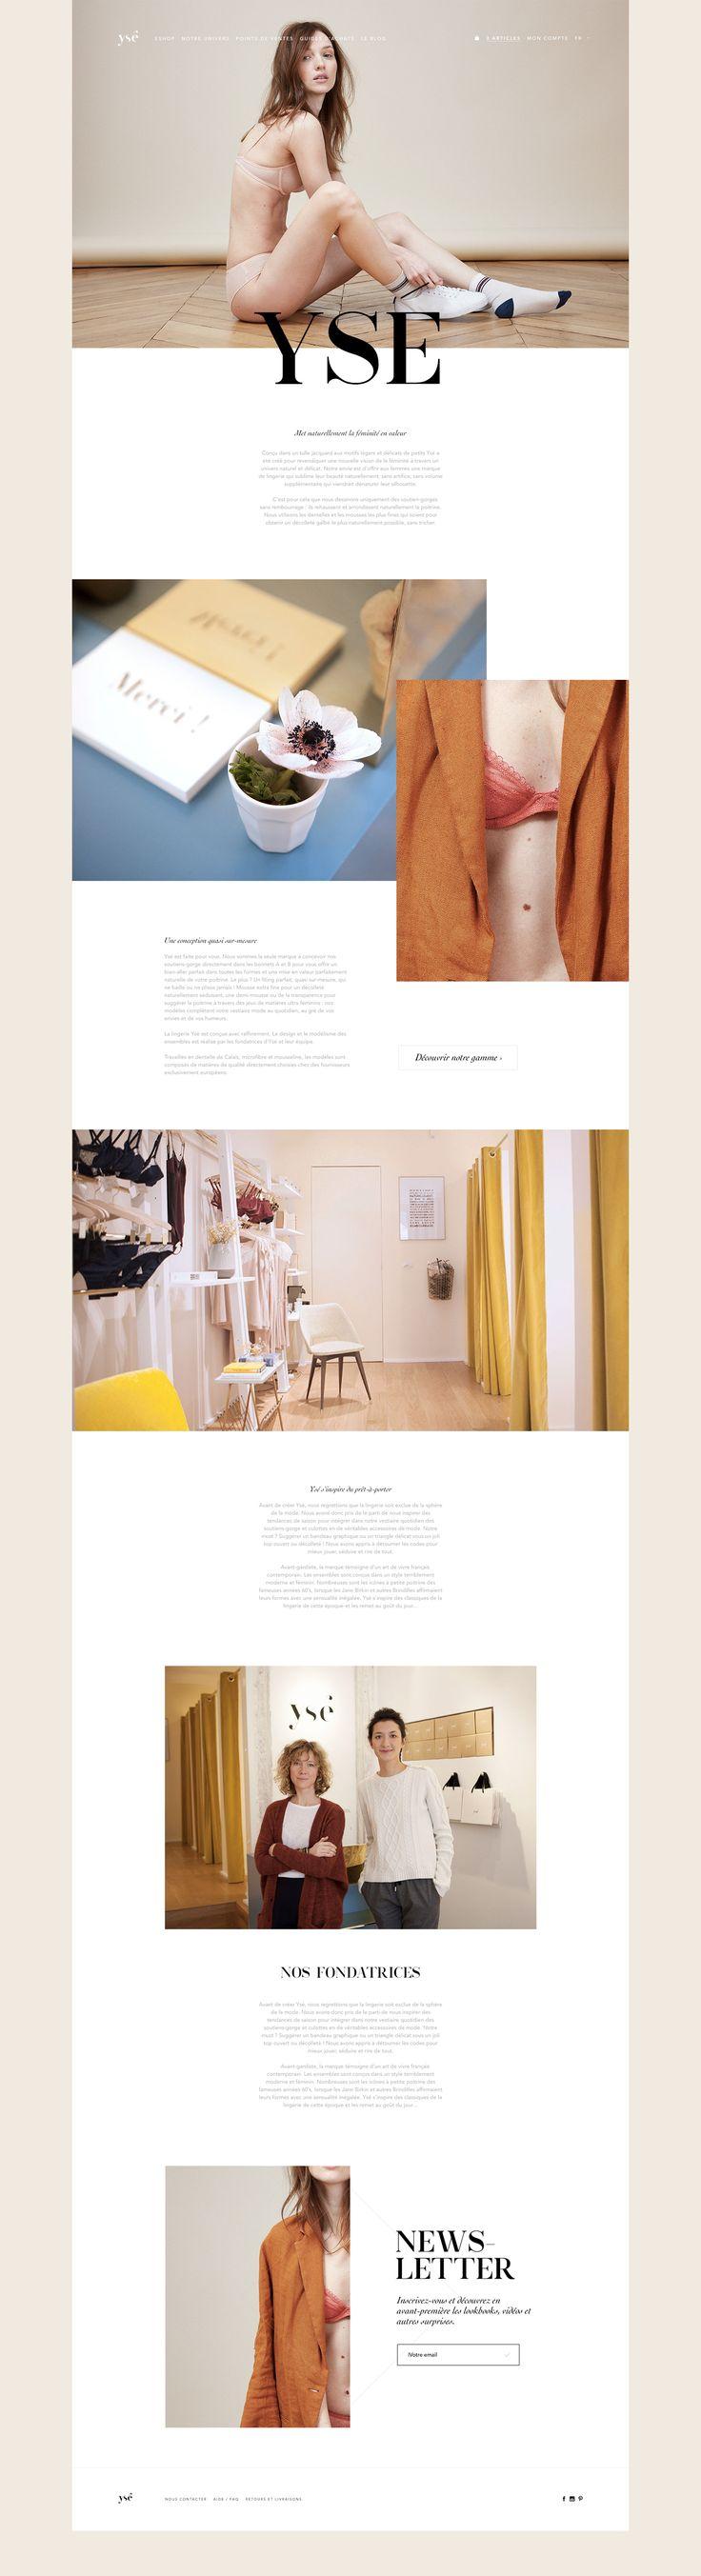 Ysé - Website on Behance